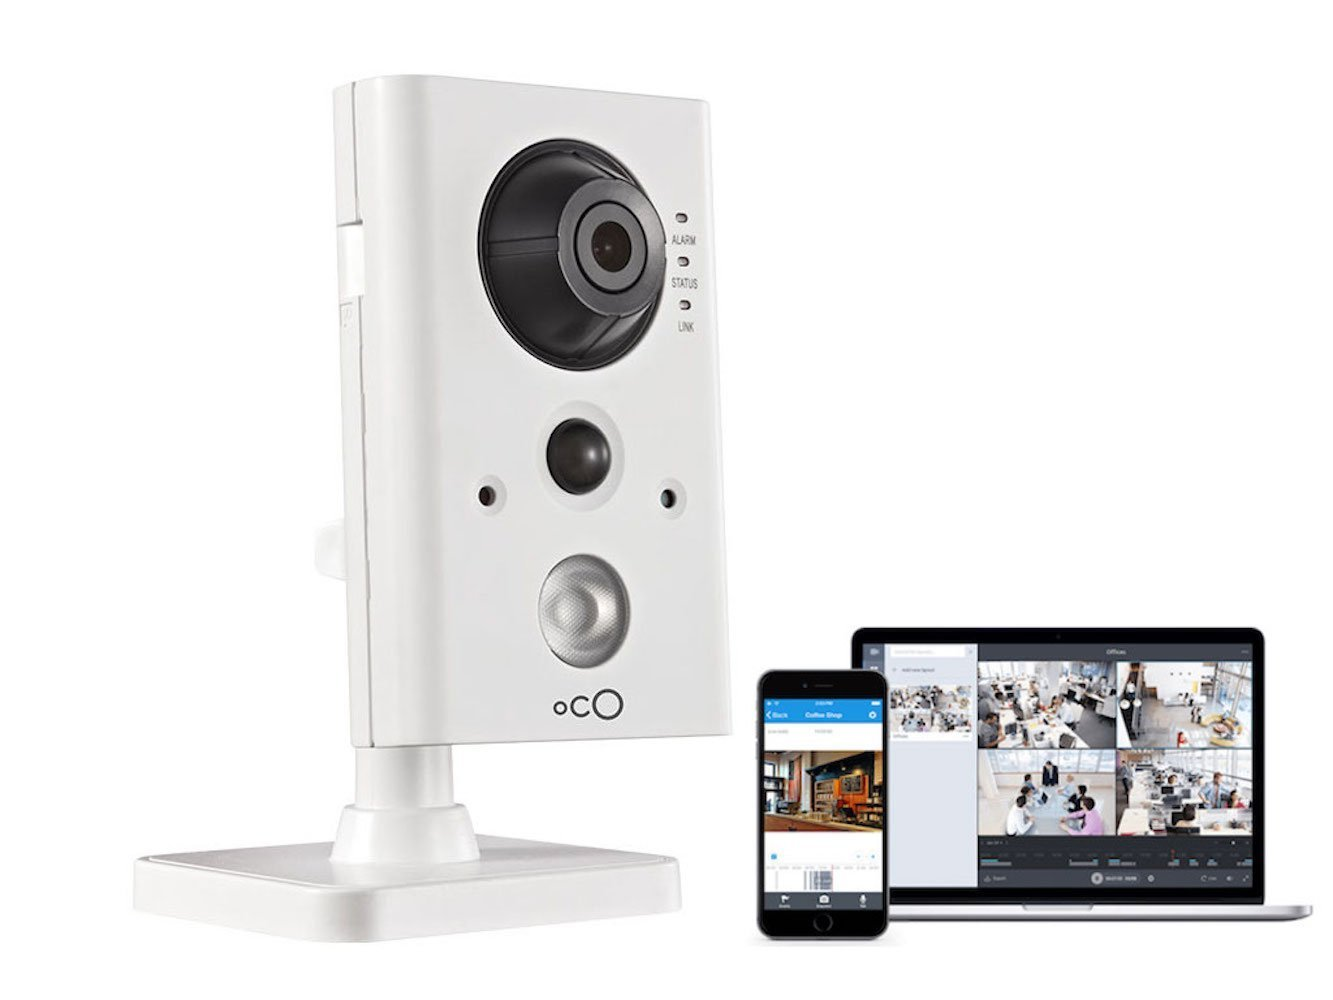 Caméra cube sans fil Oco